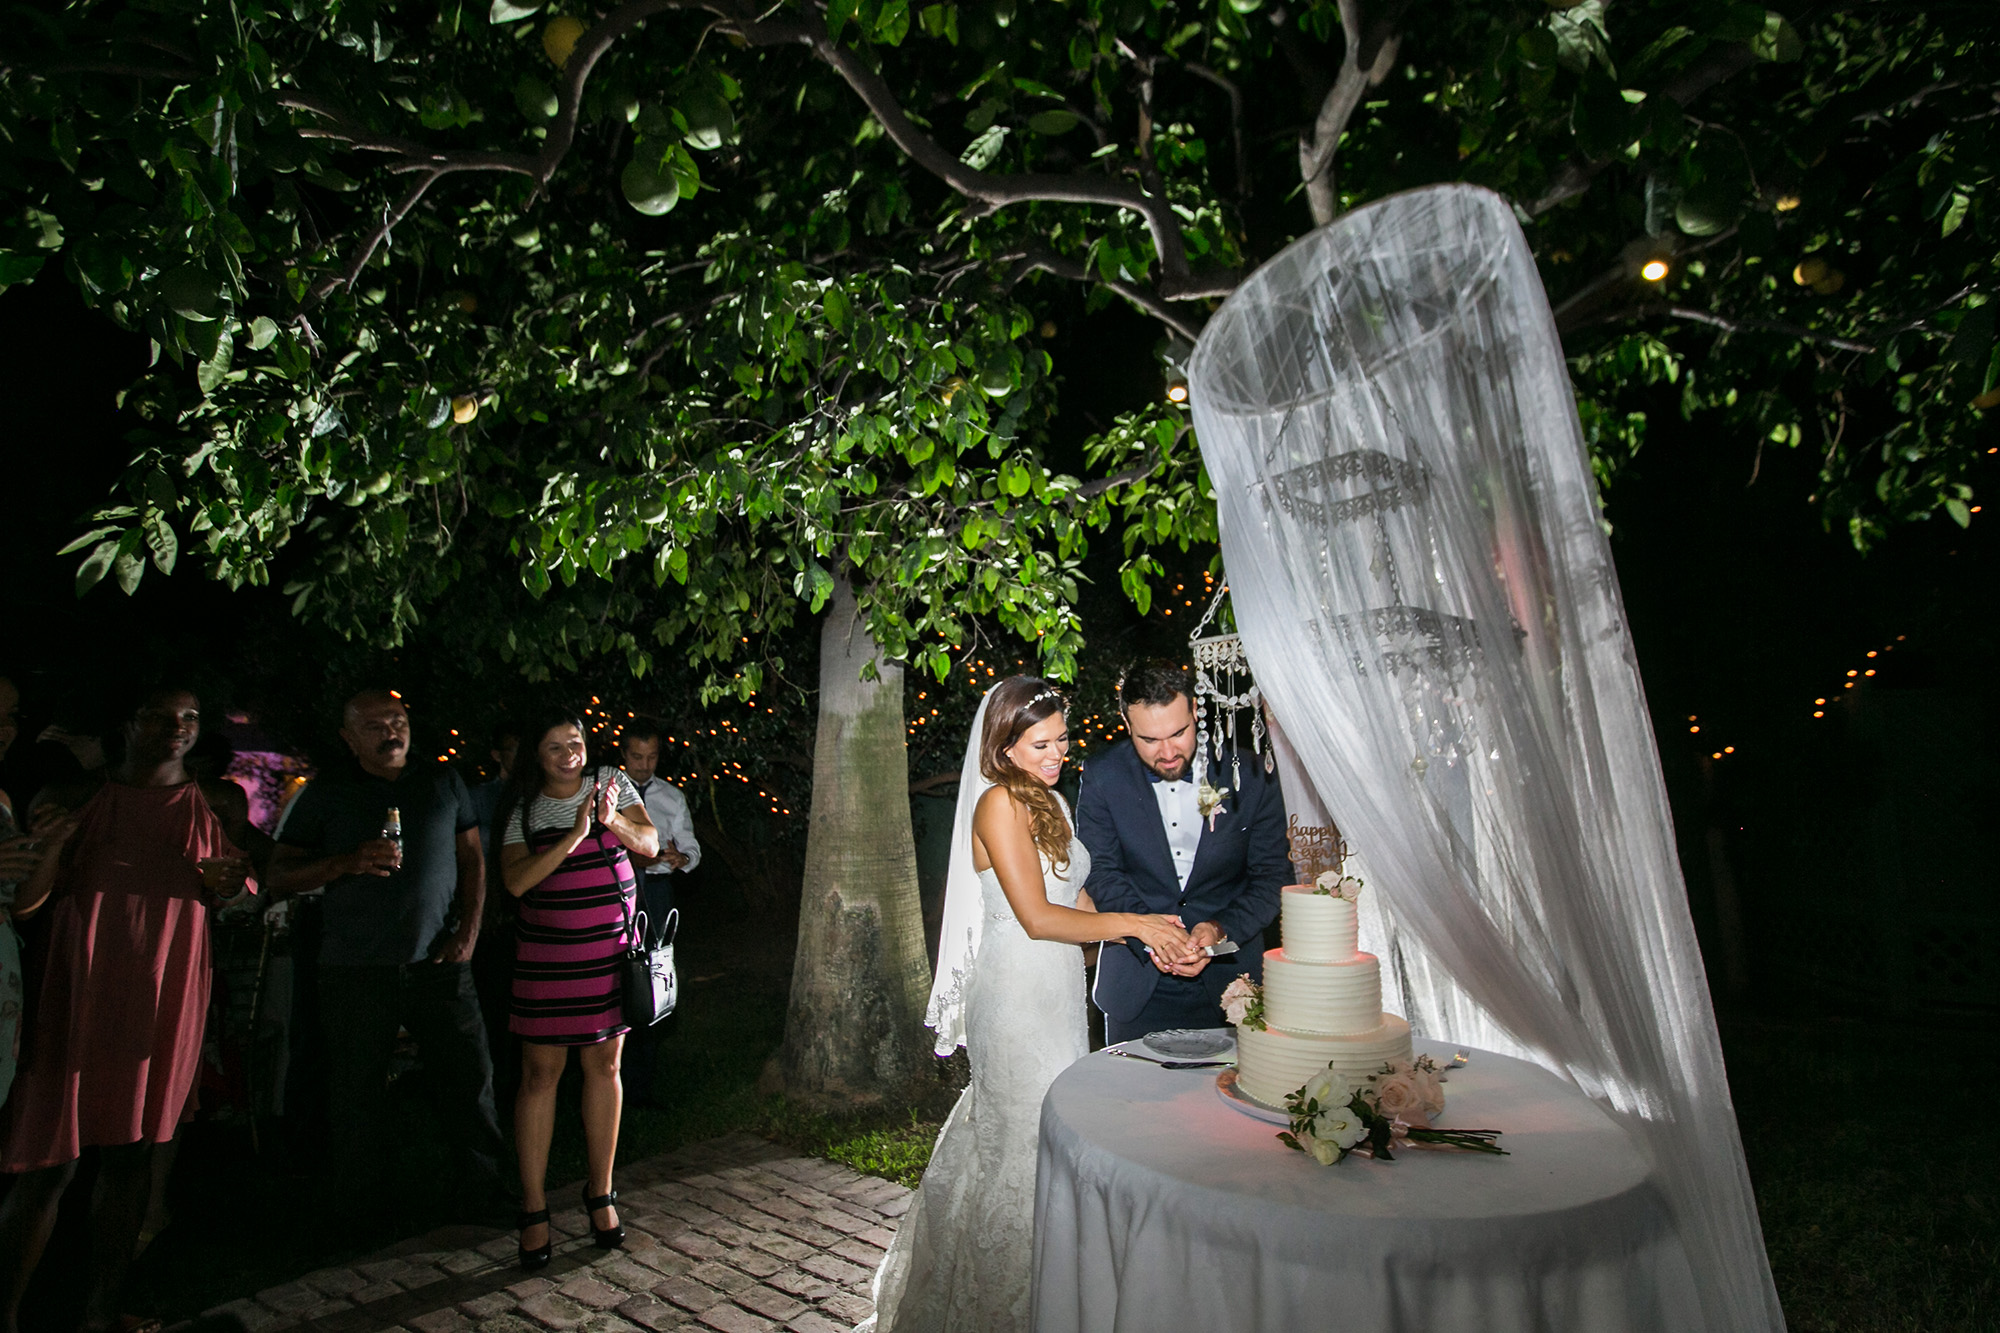 christmas-house-weddings-receptions-carrie-vines-118.jpg